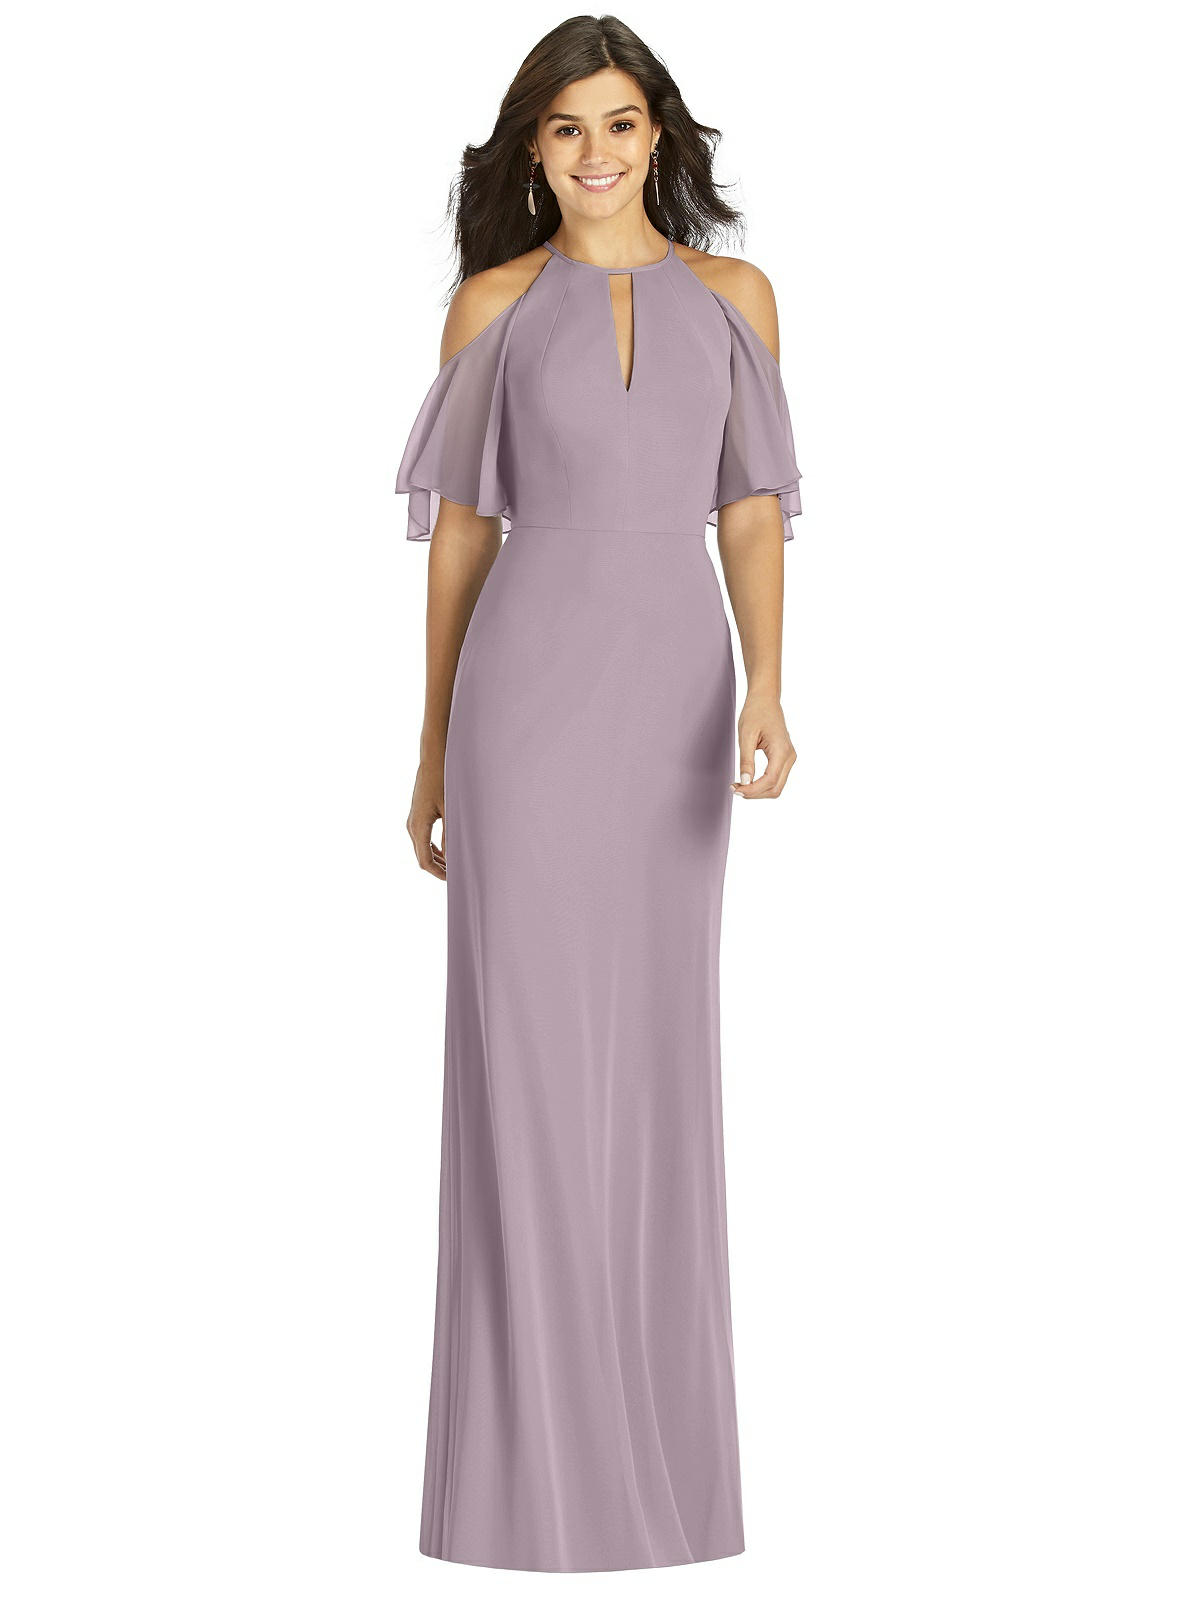 Plus Women Ruffle Bell Sleeve Mermaid Maxi Dress Cutout Cold Shoulder Gown